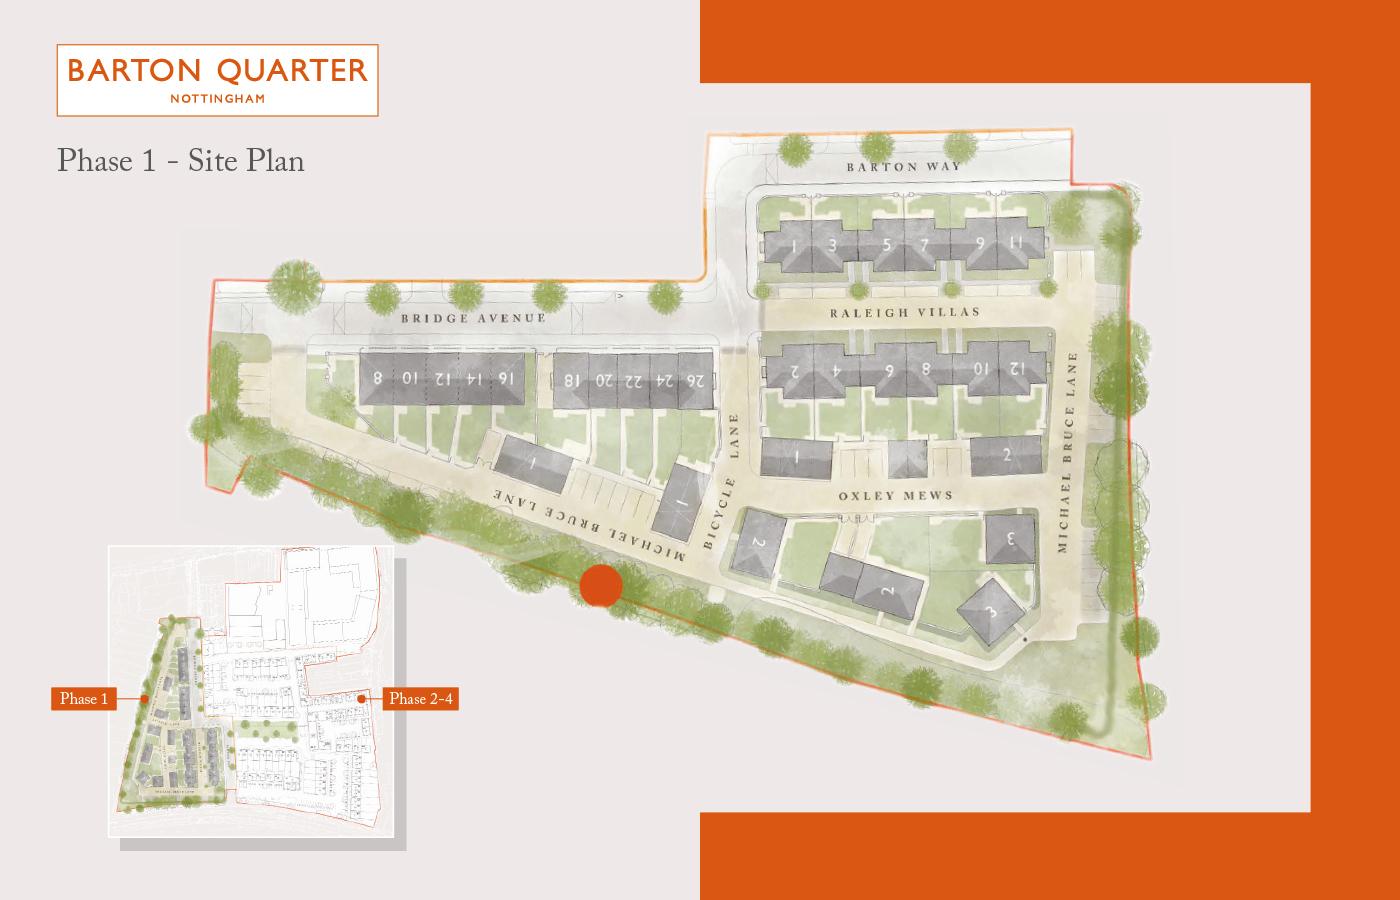 luxury apartment nottingham barton quarter overall plan